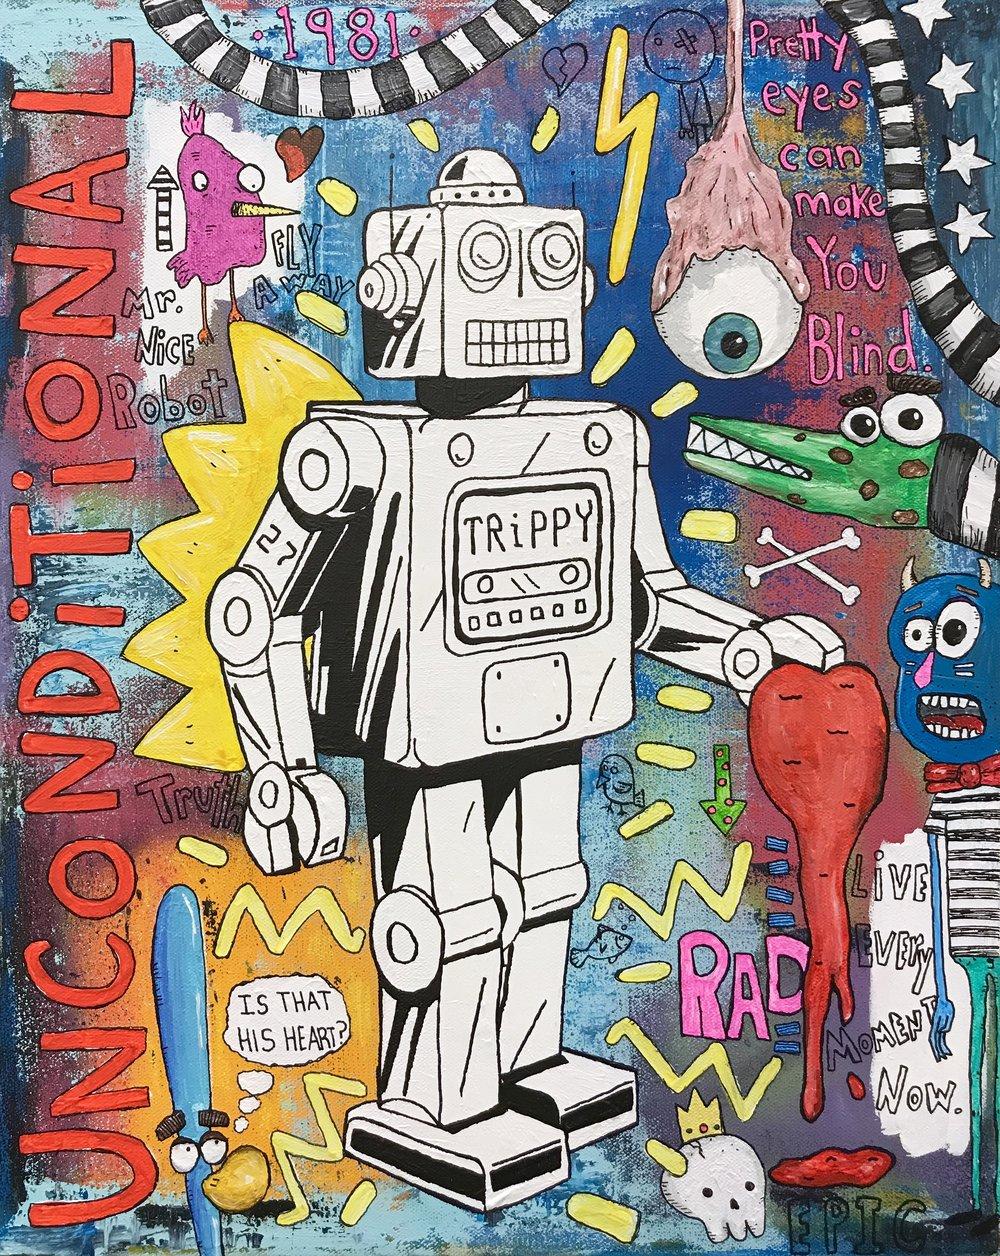 Trippy Robot